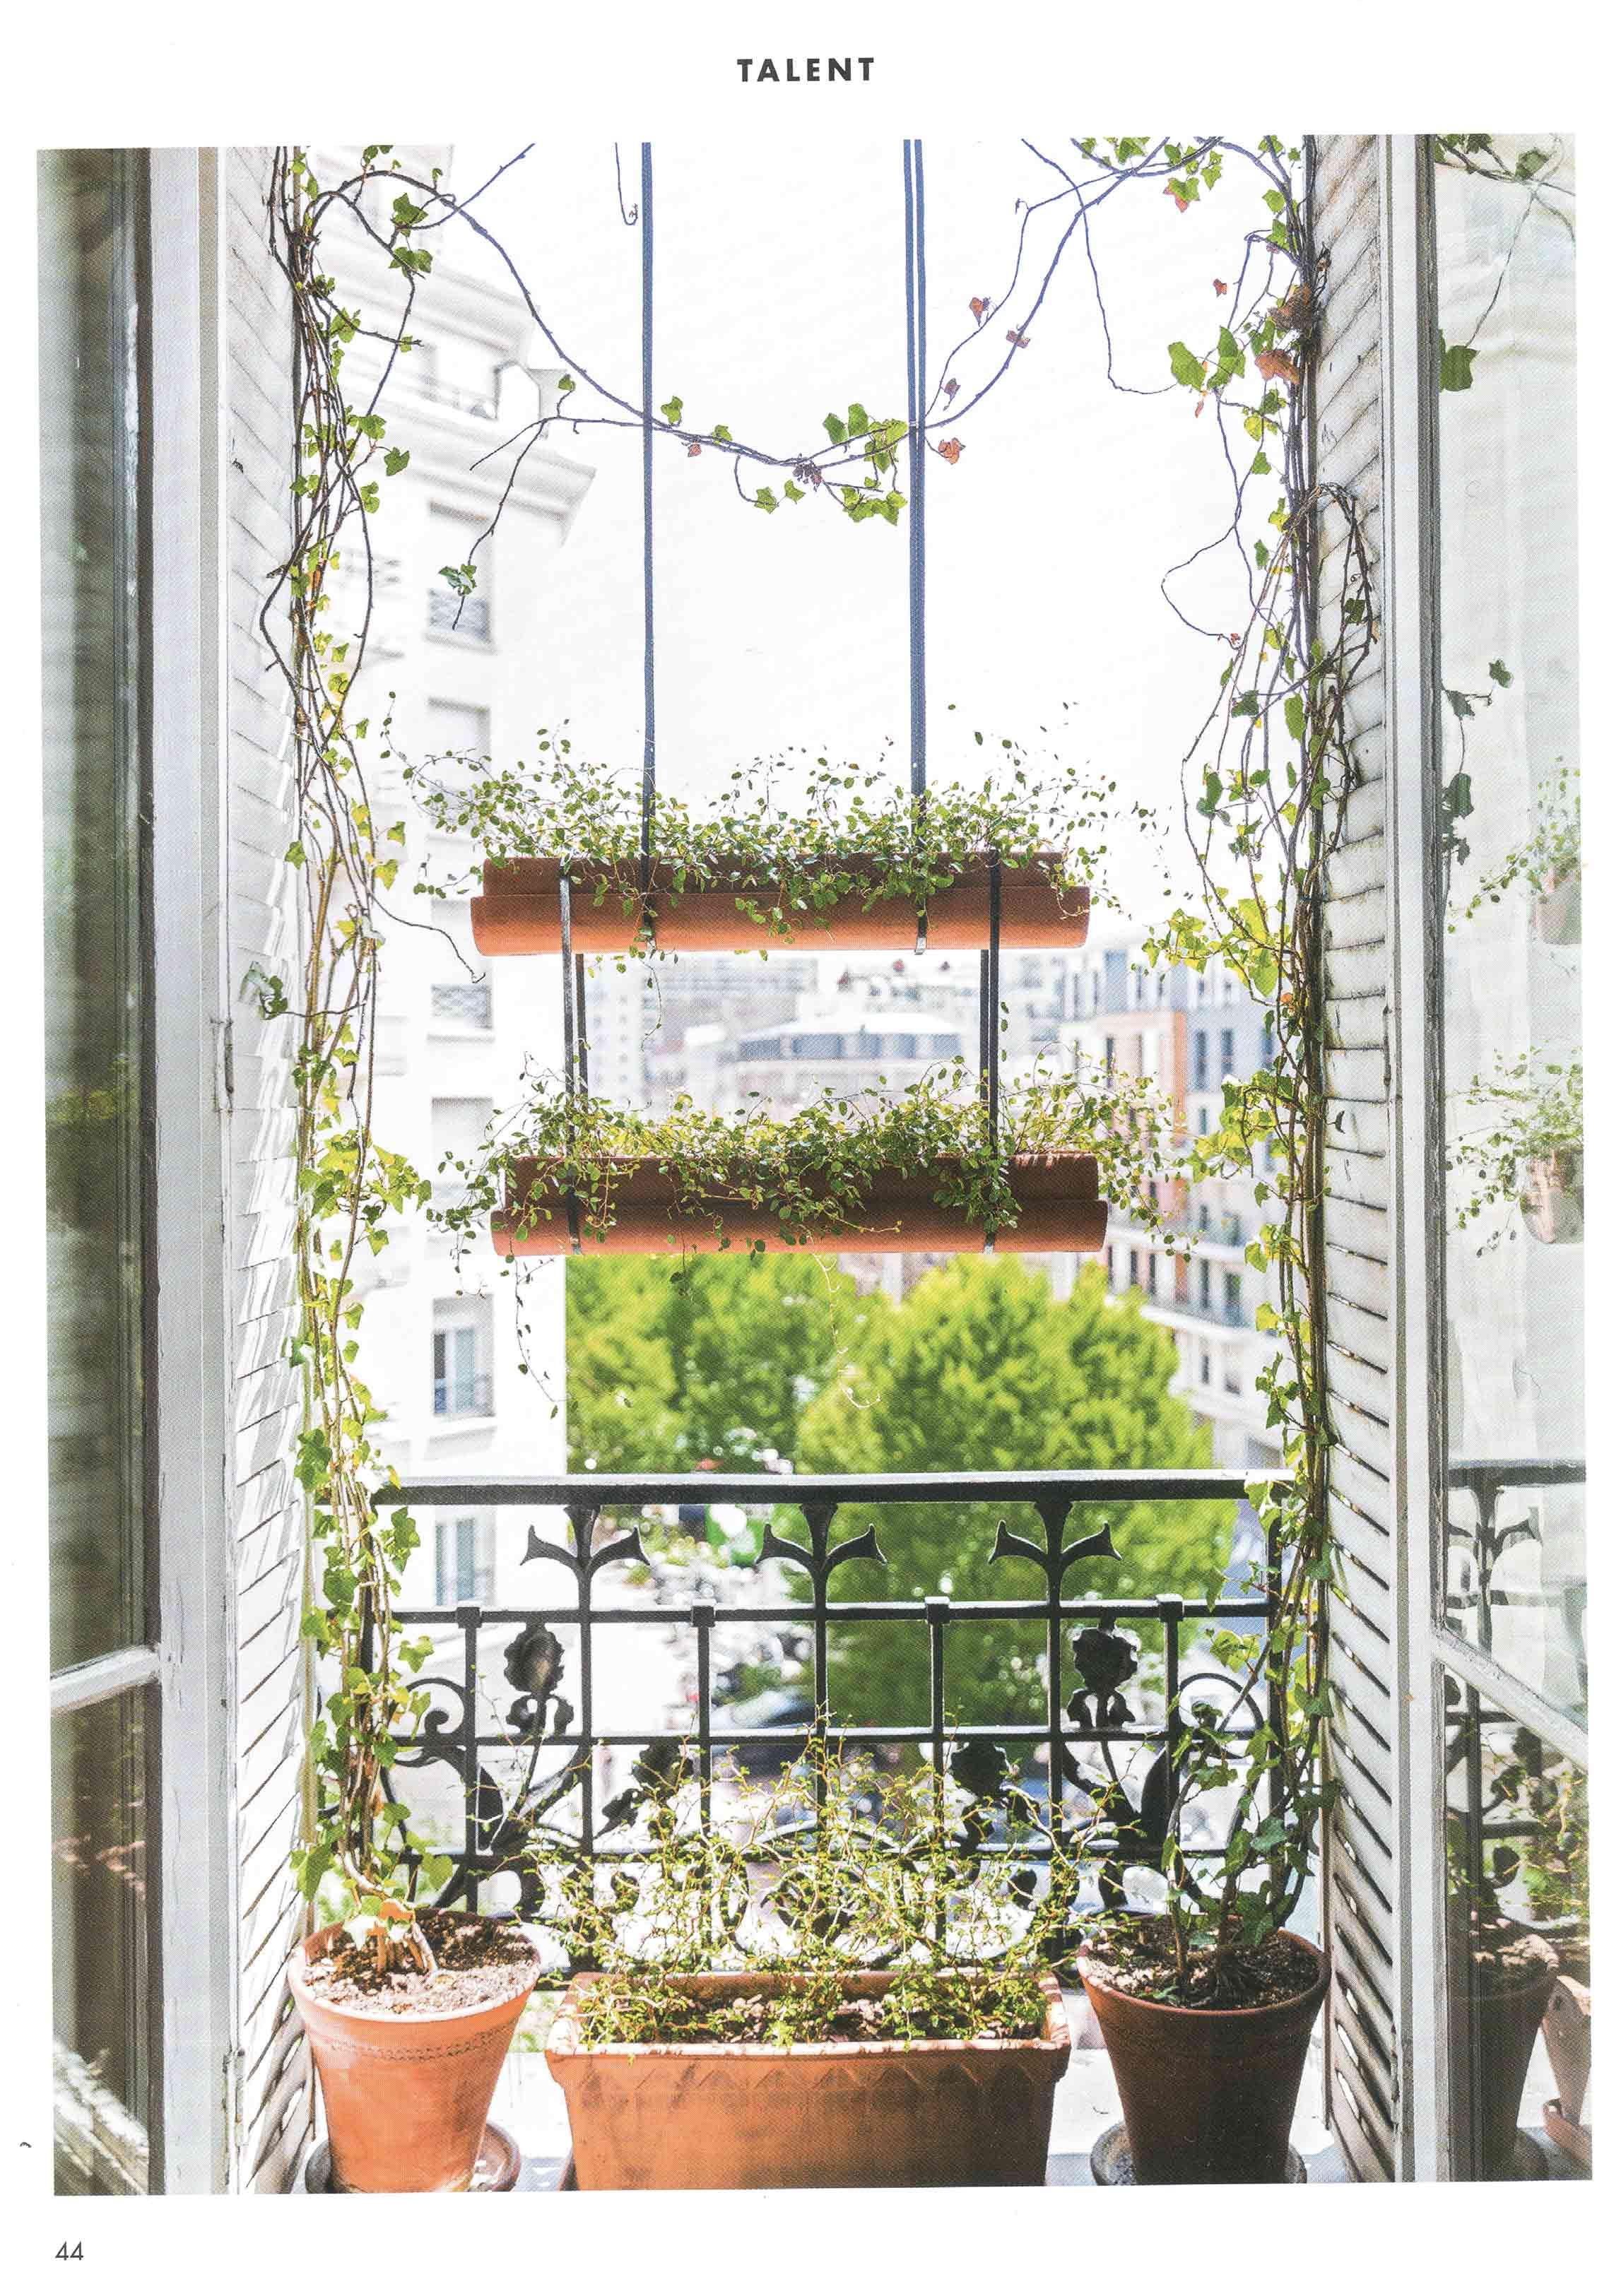 Jardiniere Botany Folk @cote paris